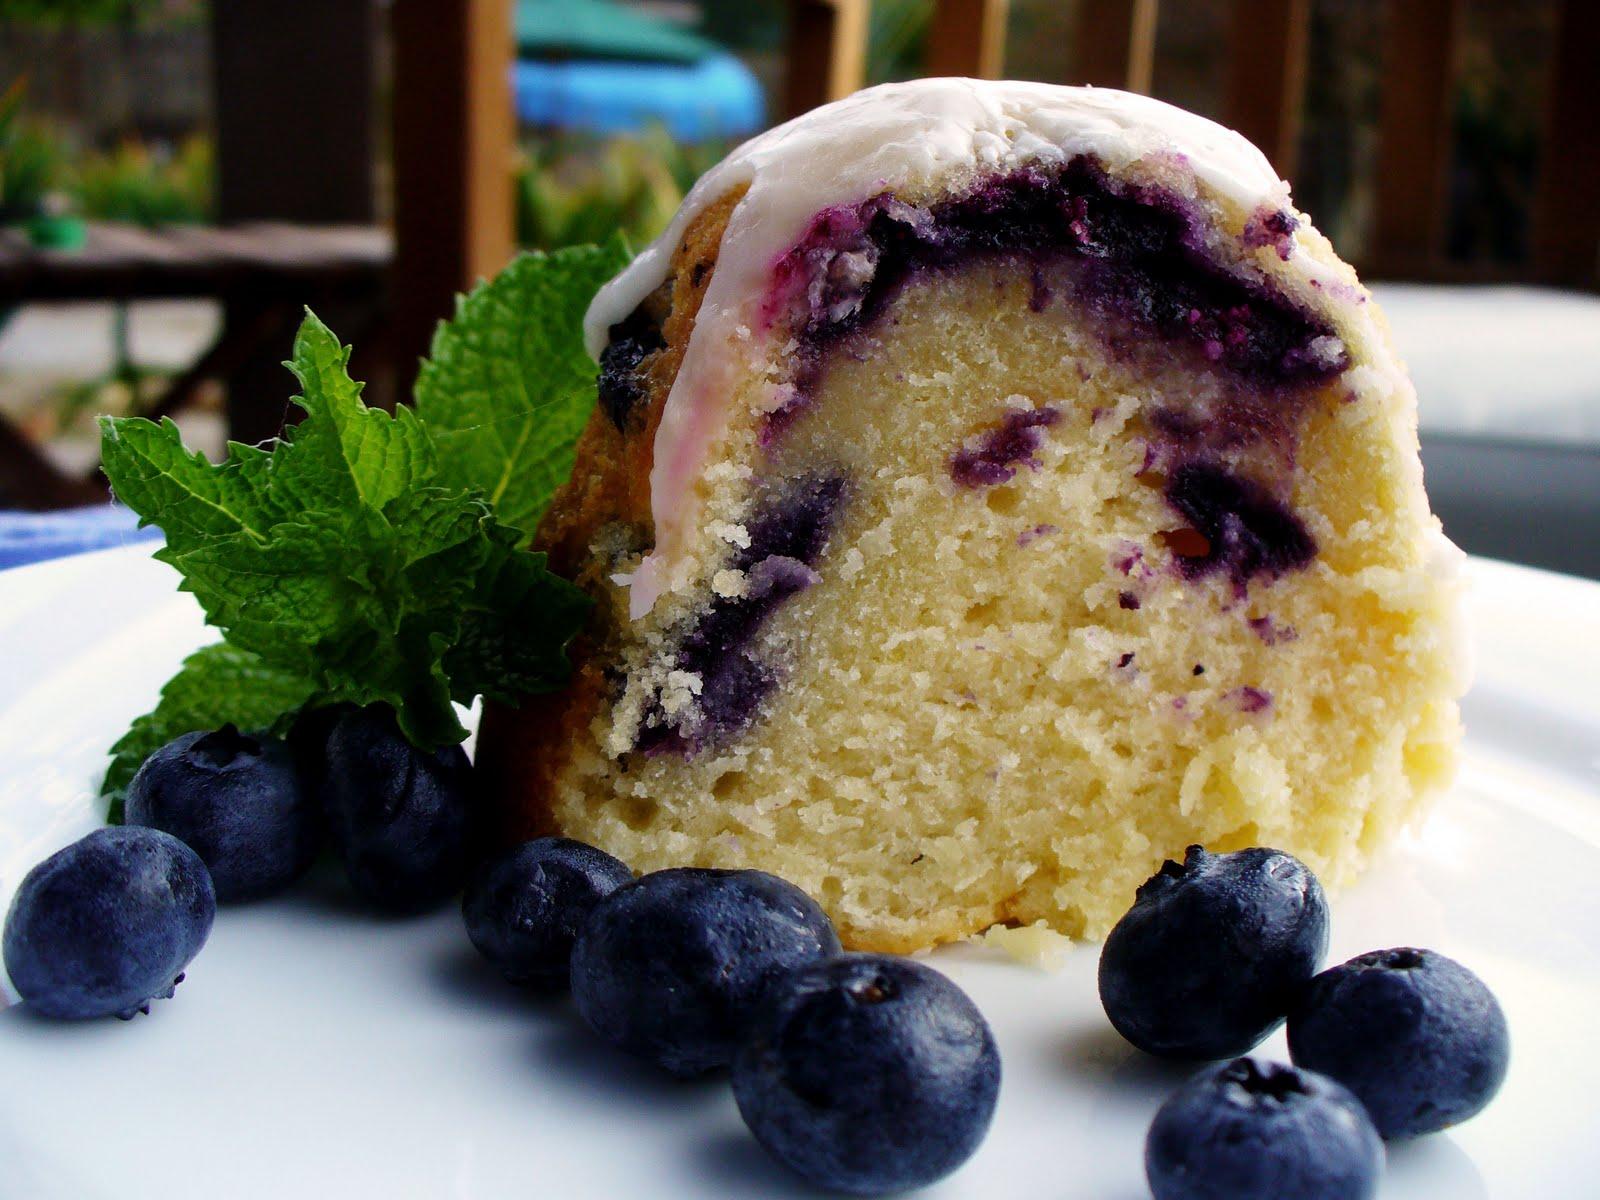 Sour Cream Lemon Blueberry Pound Cake